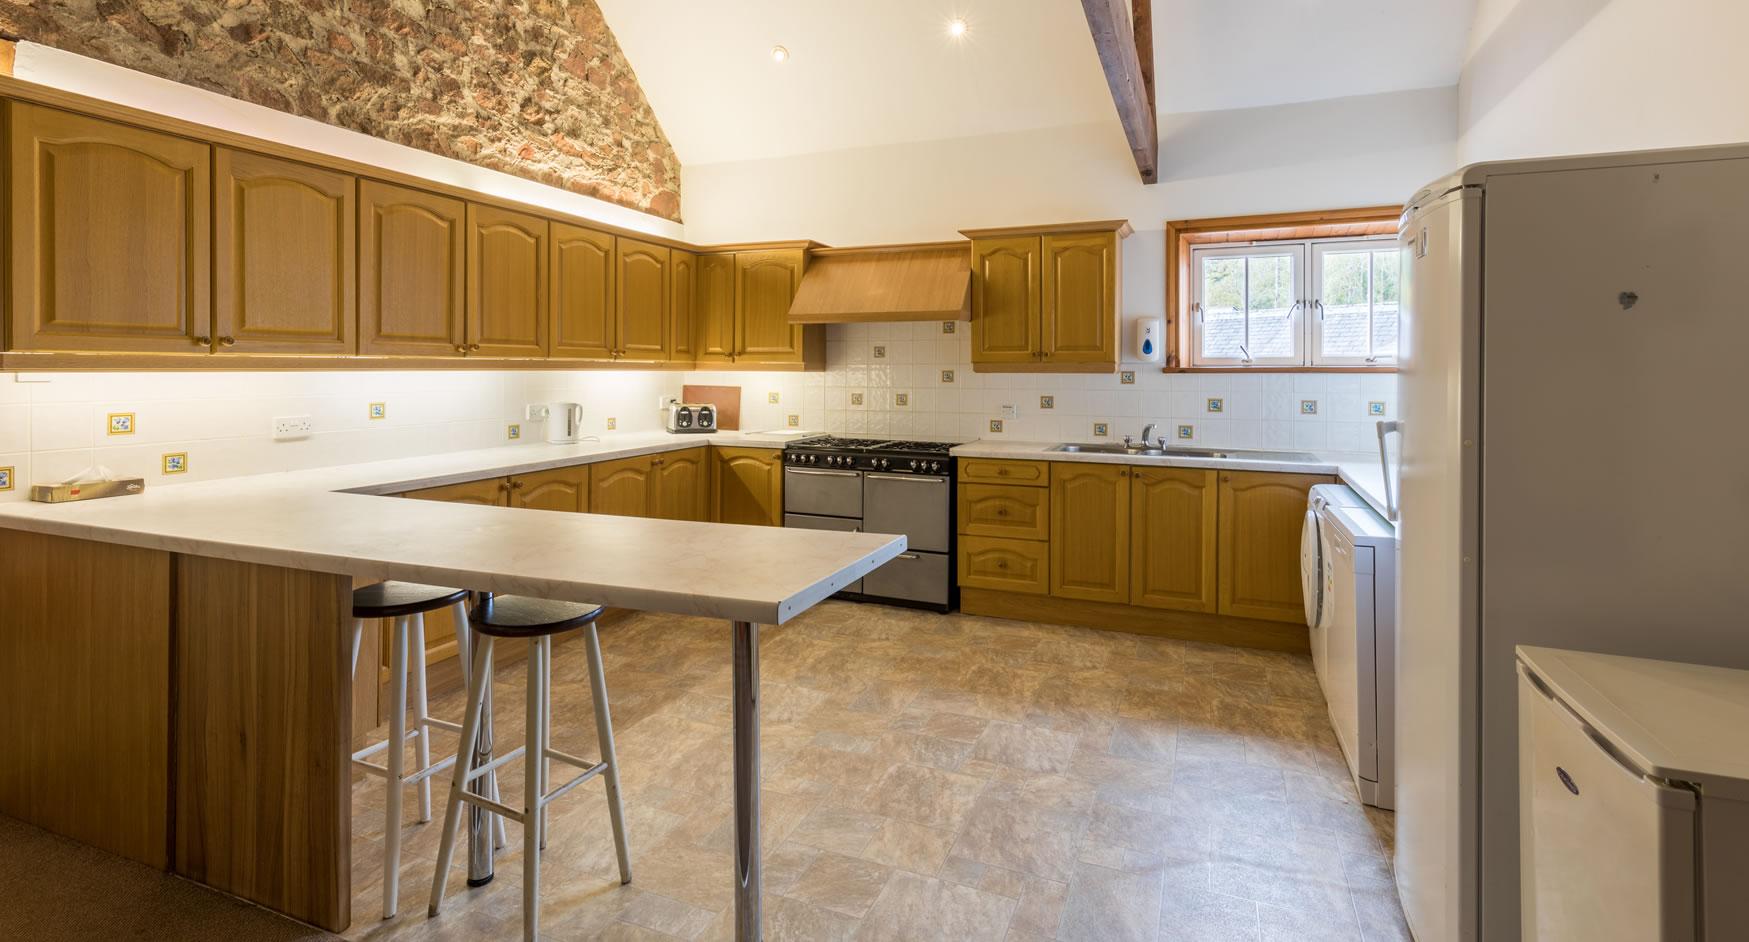 Coachman's Quarters Kitchen